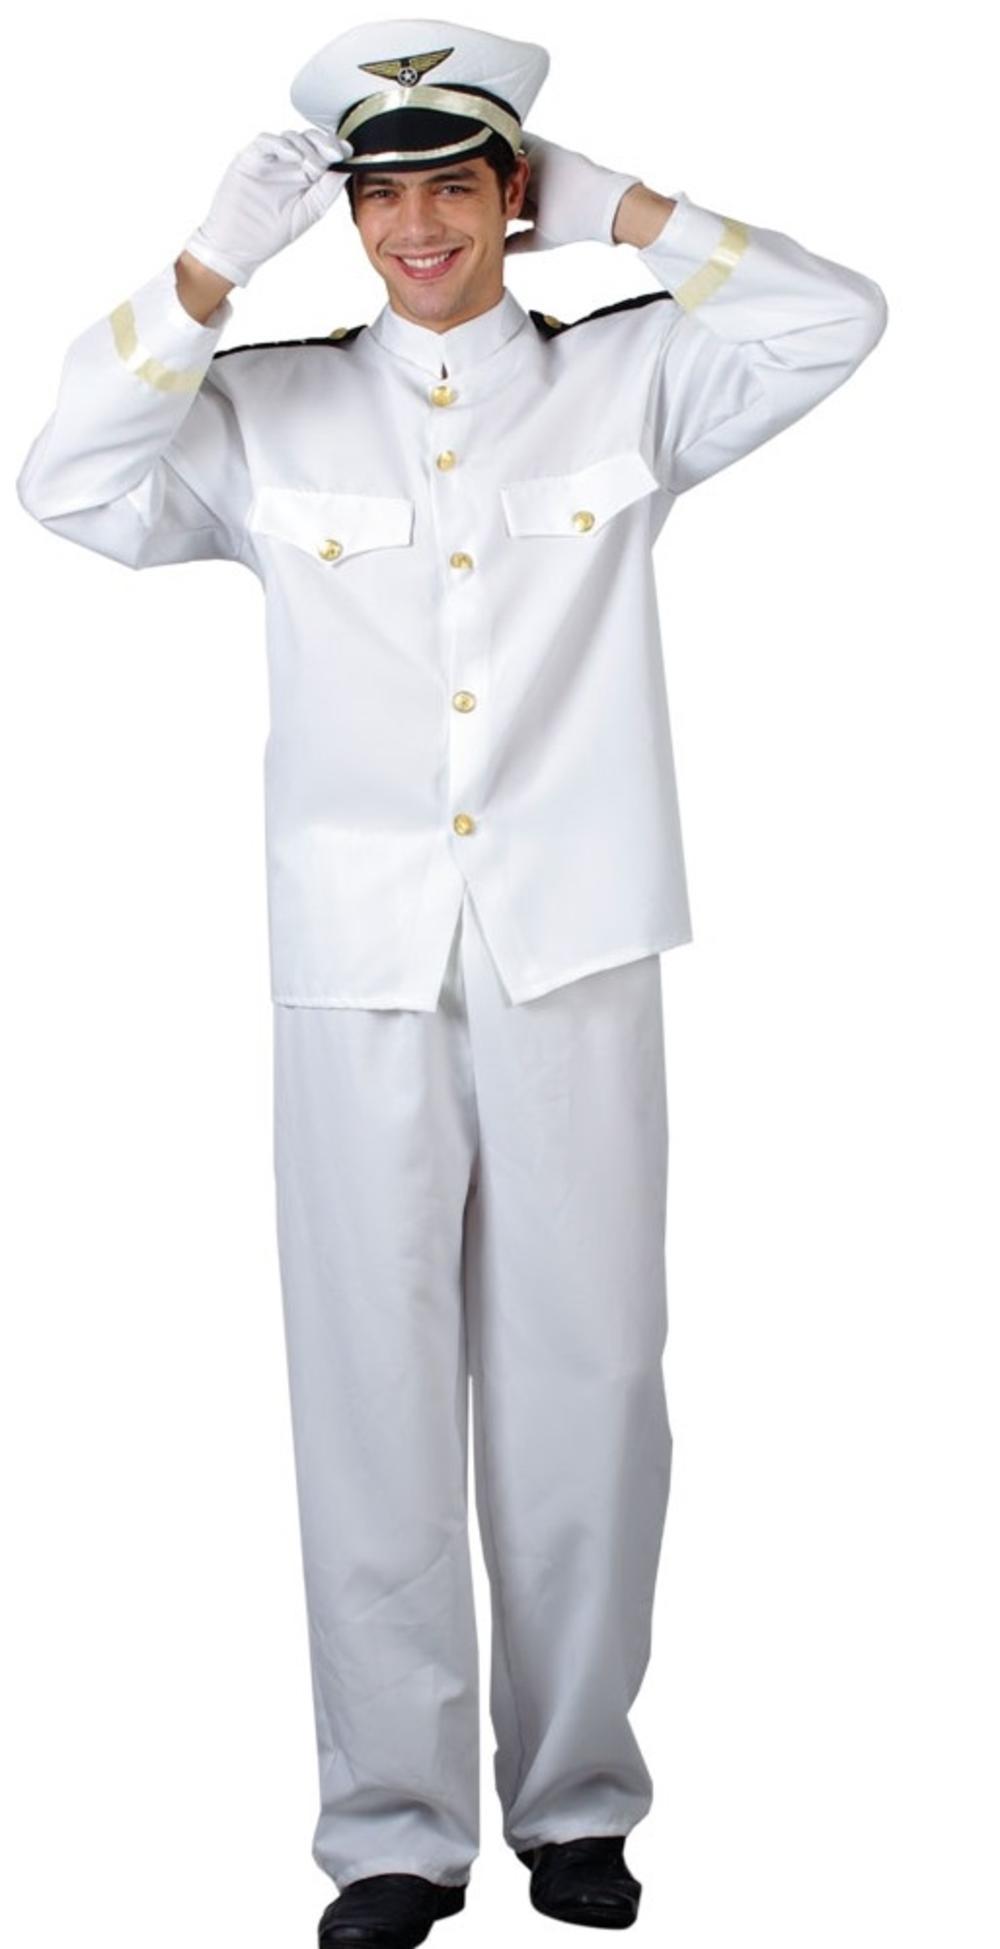 Naval Officer Uniform + Hat Mens Fancy Dress Navy Sailor Costume Adults Outfit